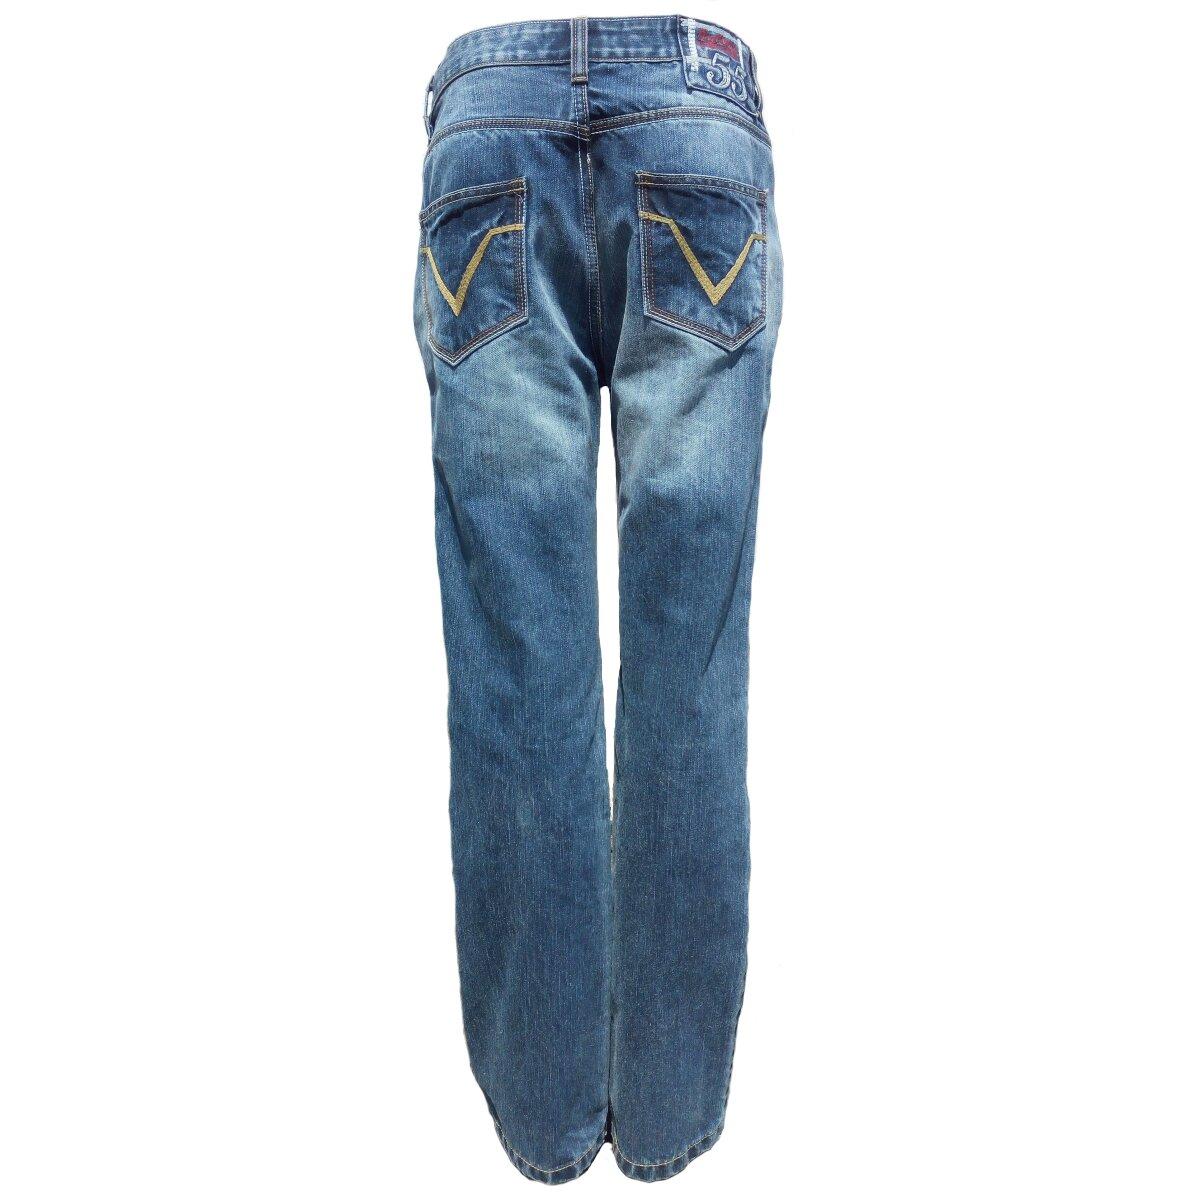 king kerosin speed king herren jeans wild wear 179 00. Black Bedroom Furniture Sets. Home Design Ideas